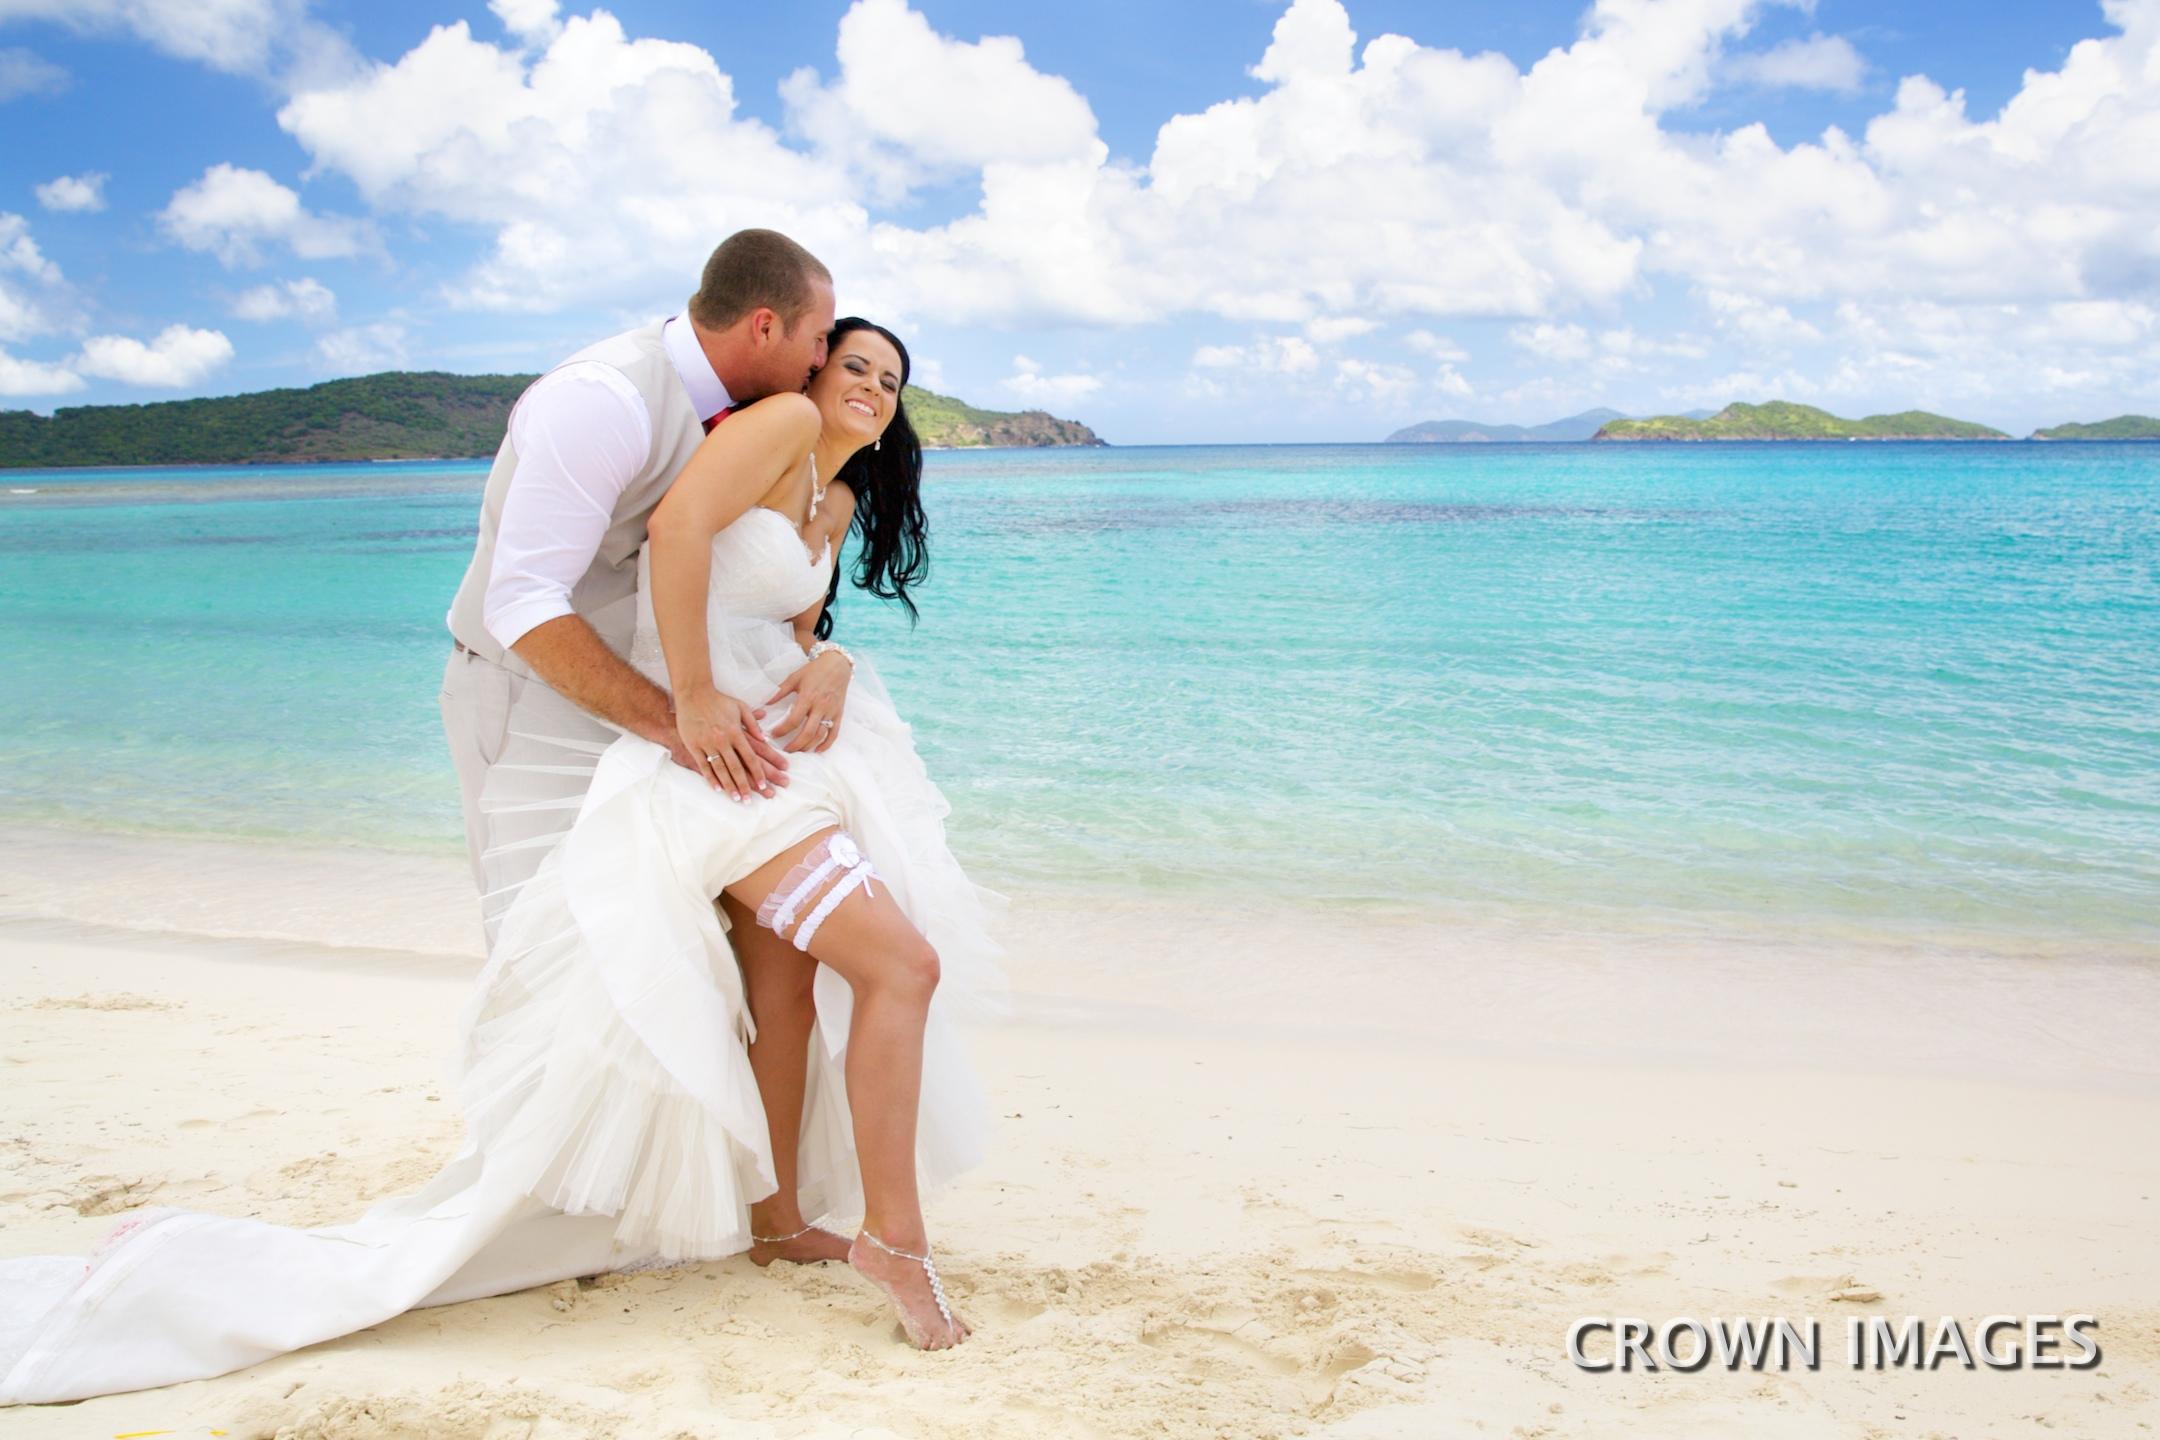 beach wedding virgin islands photo by crown images